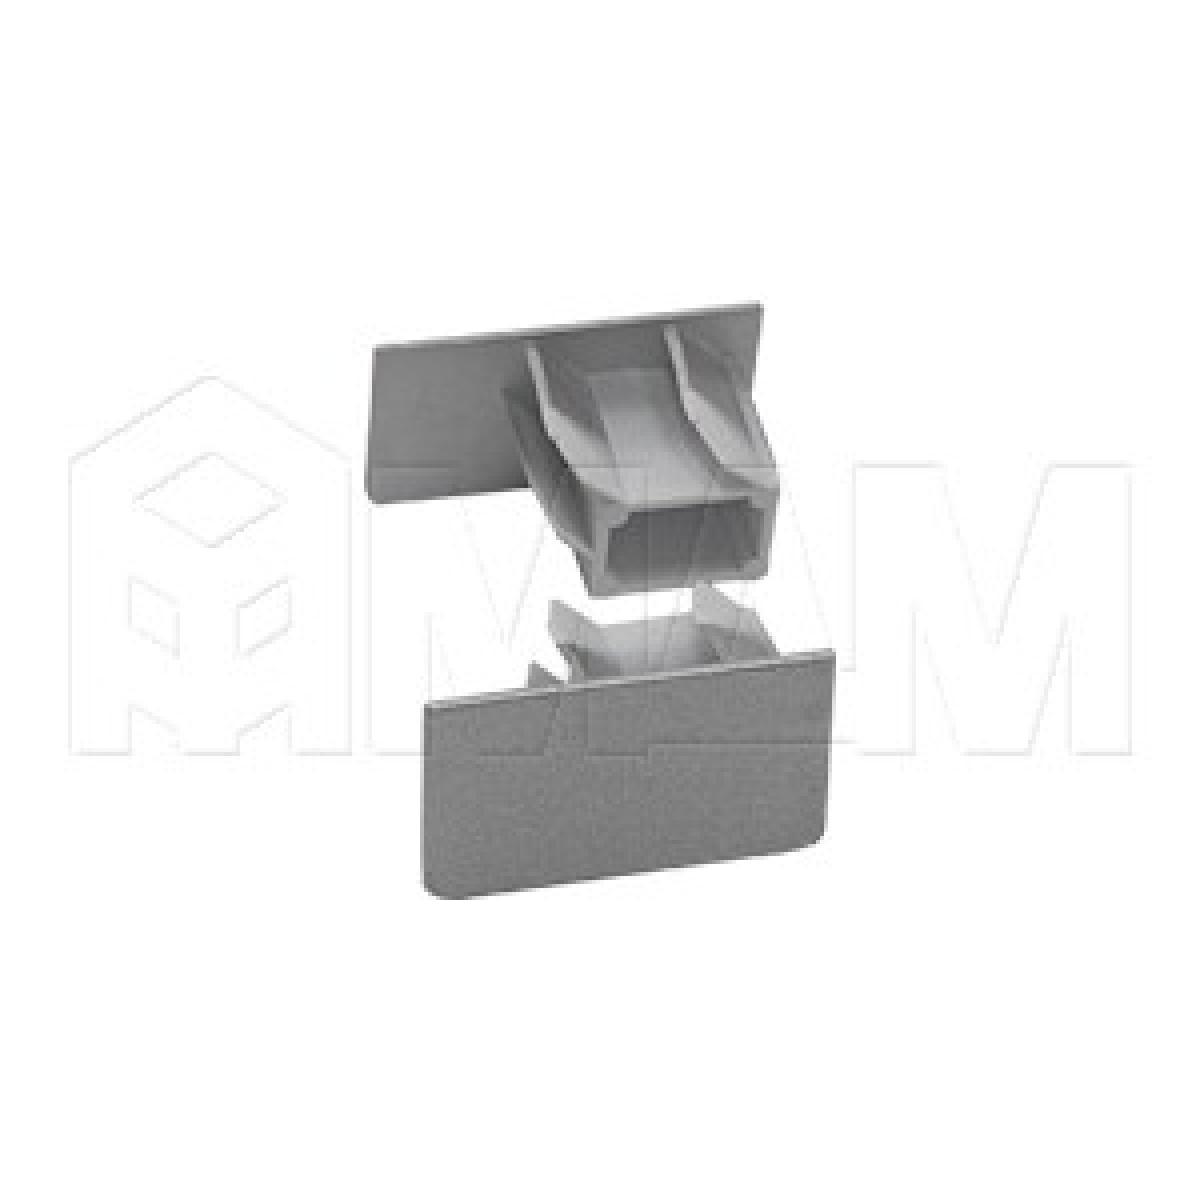 Заглушка для направляющей 7964, серебро/металлик